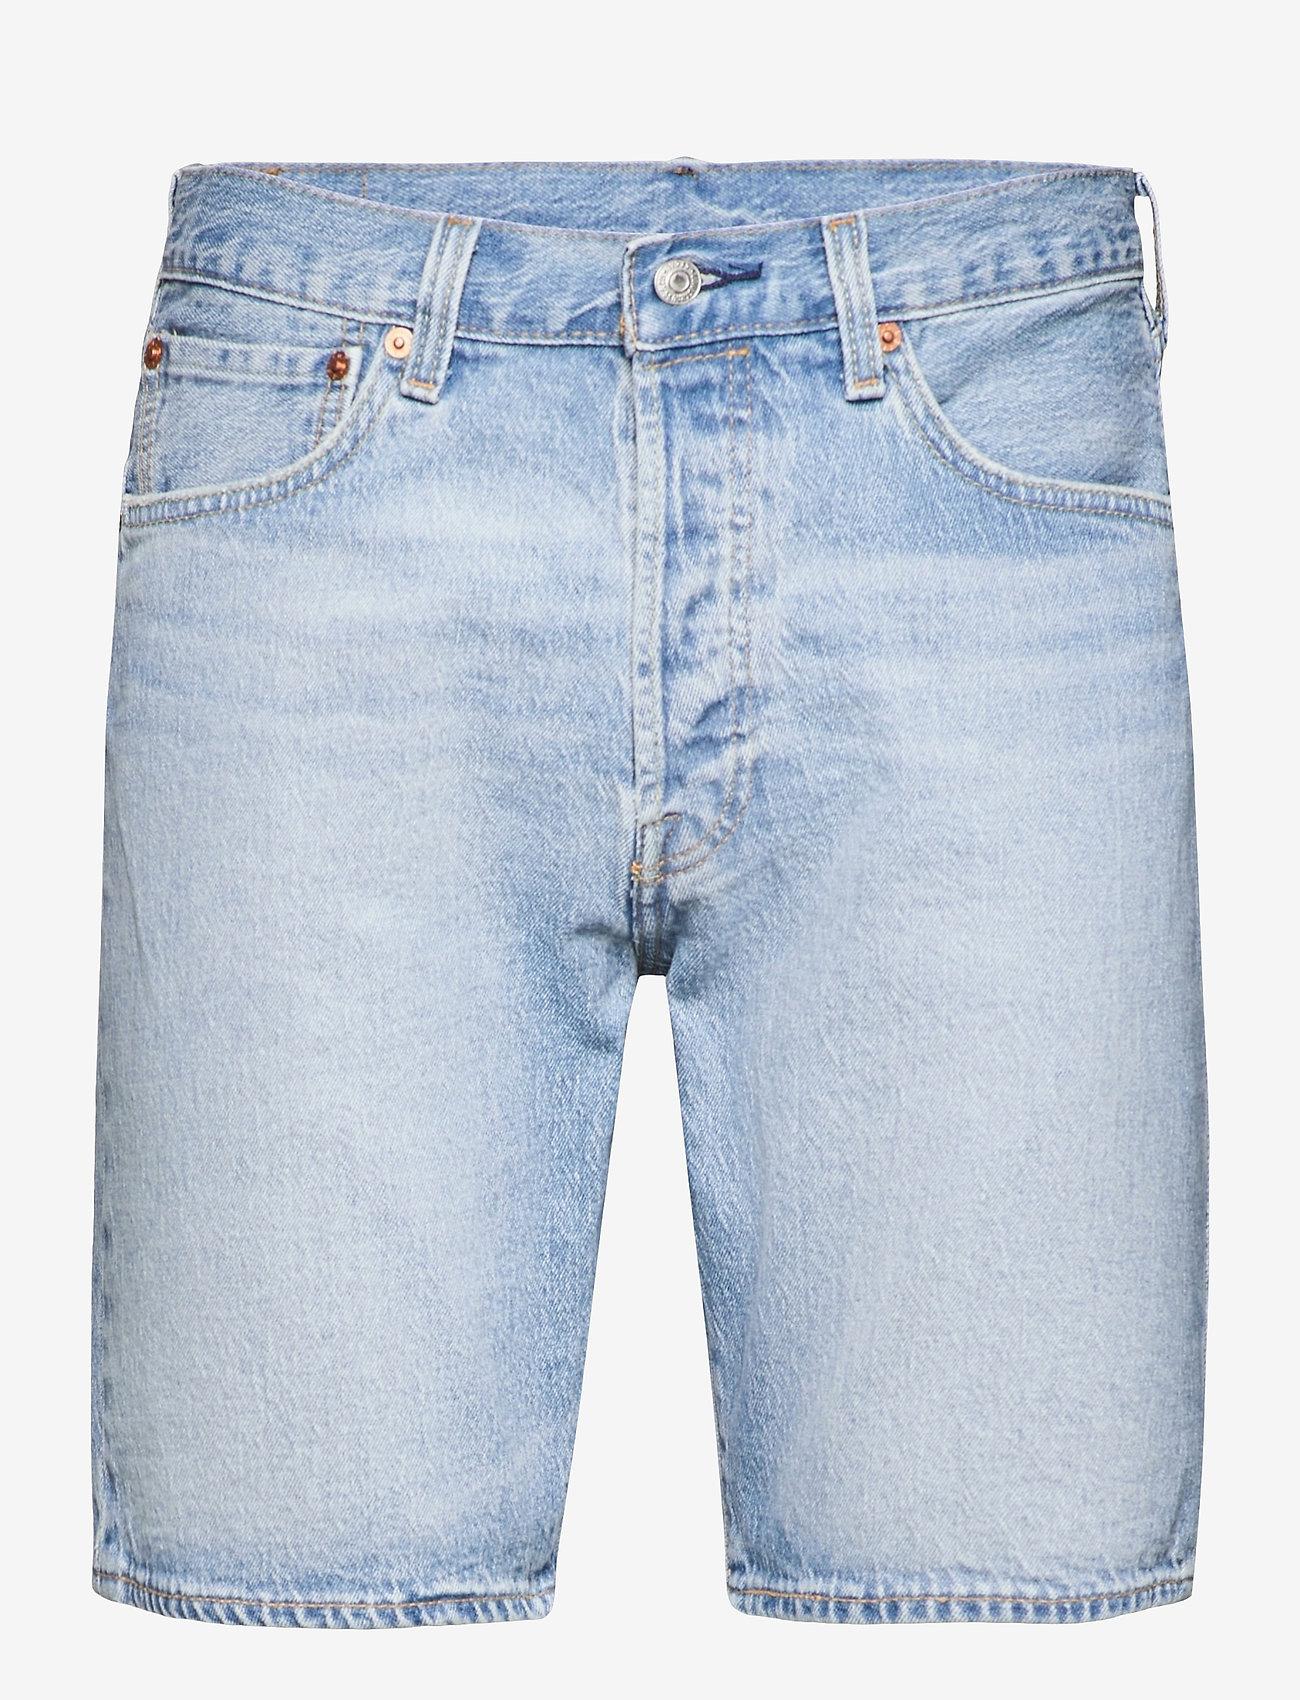 LEVI´S Men - 501 HEMMED SHORT MOUNTAIN GOAT - jeansowe szorty - light indigo - worn in - 0